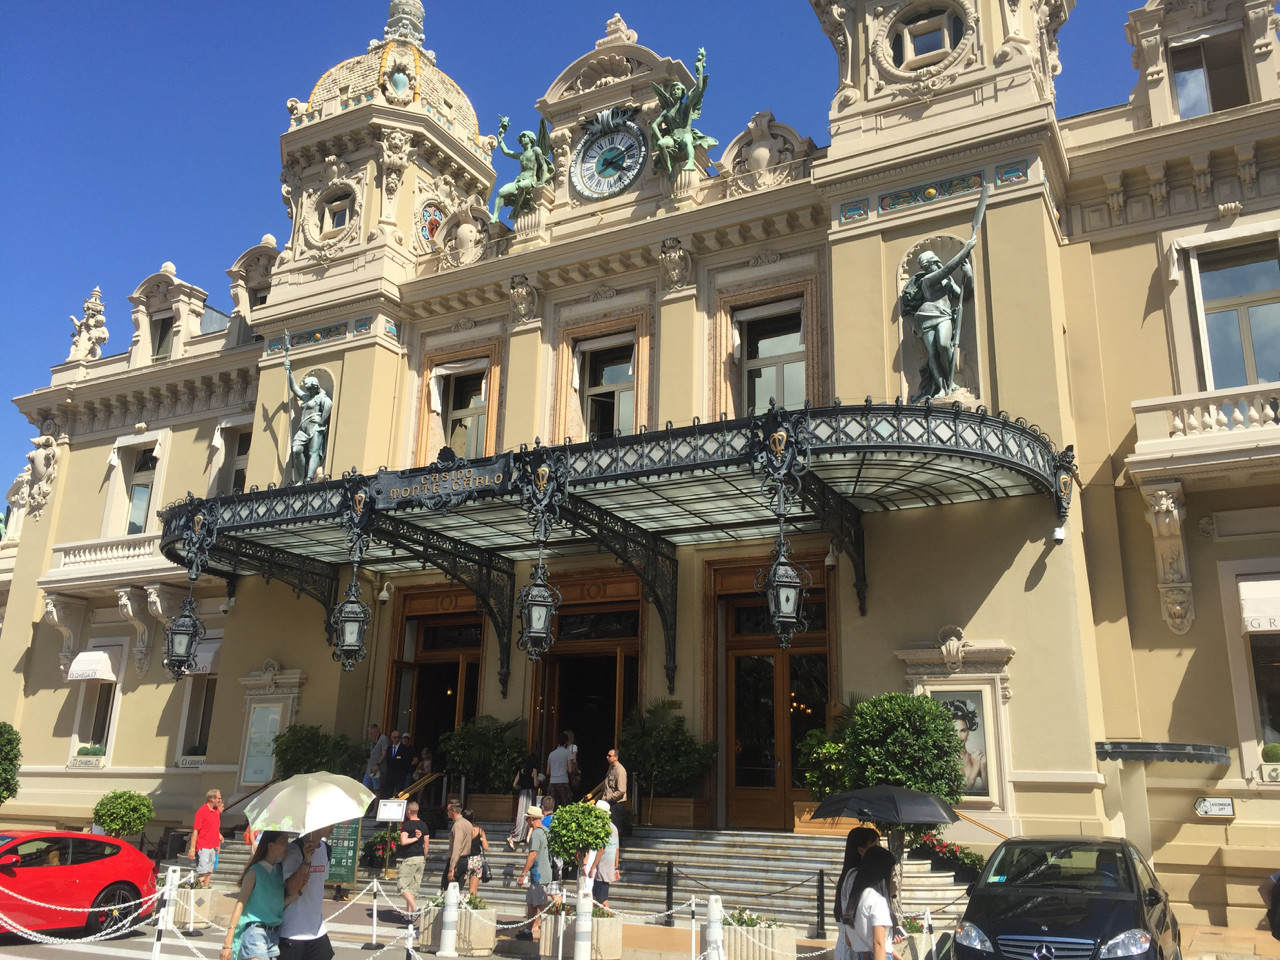 Monte Carlo casino Napoli rekordvinst